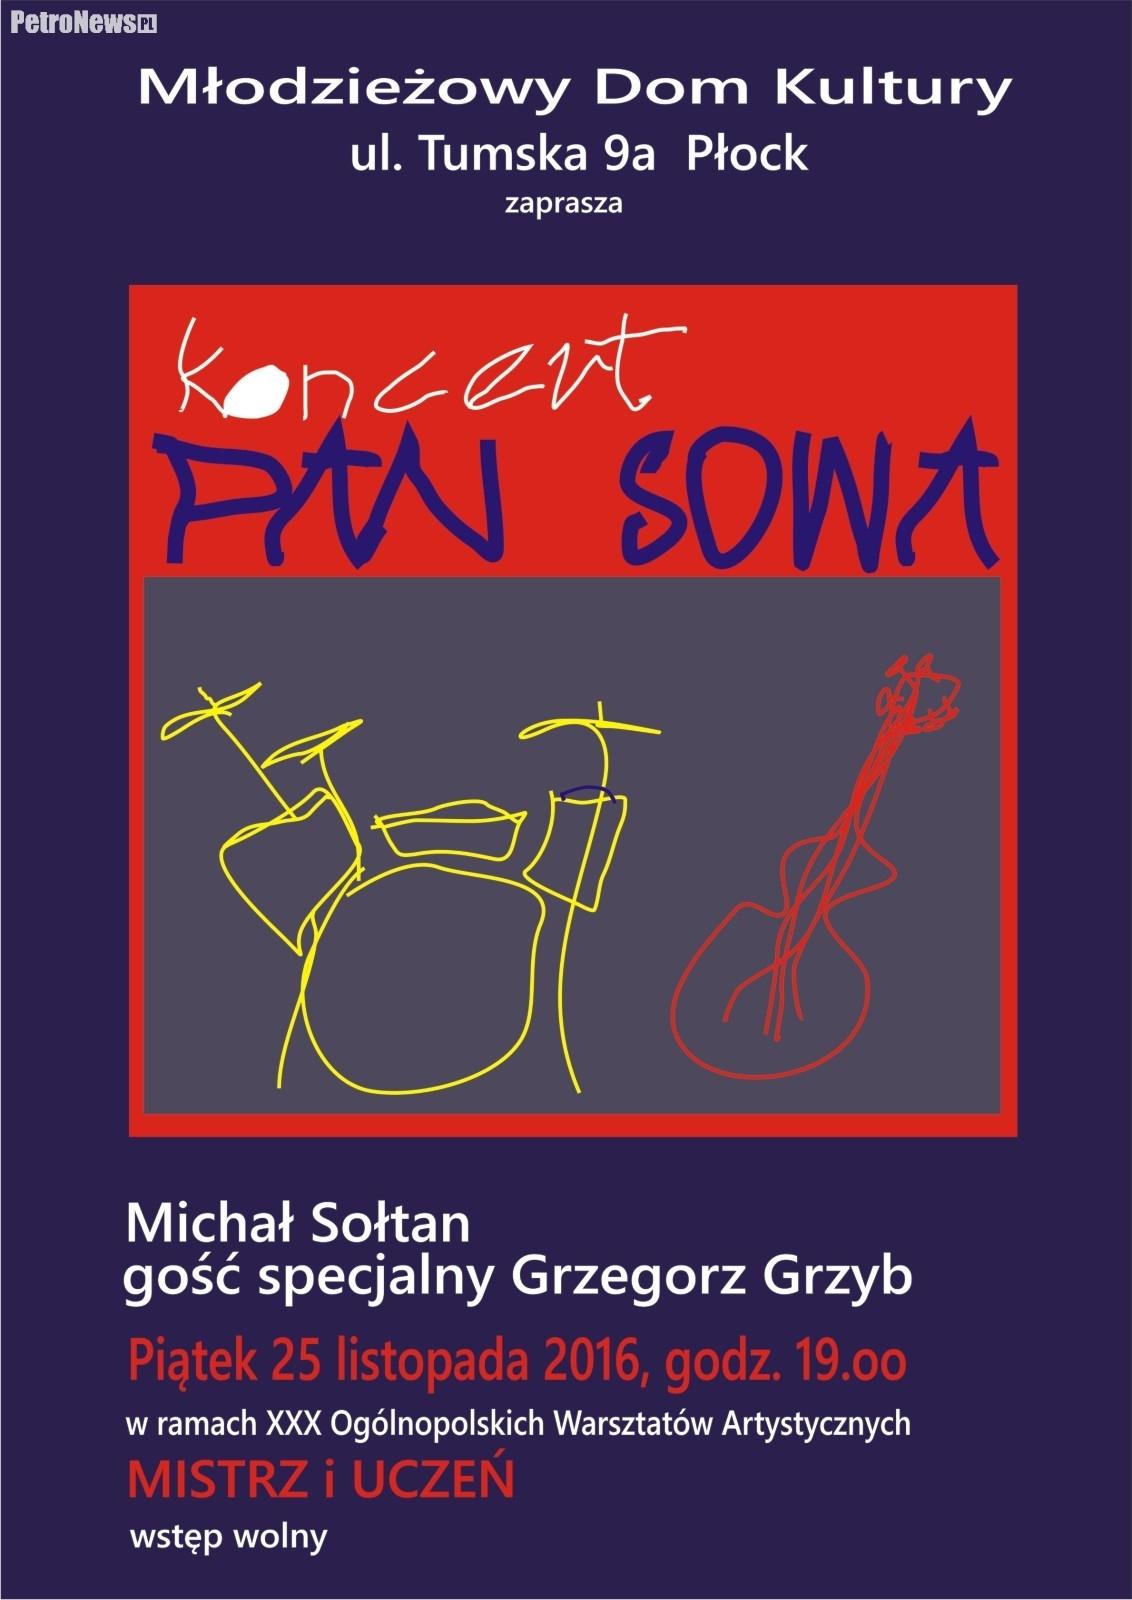 koncert-pan-sowa